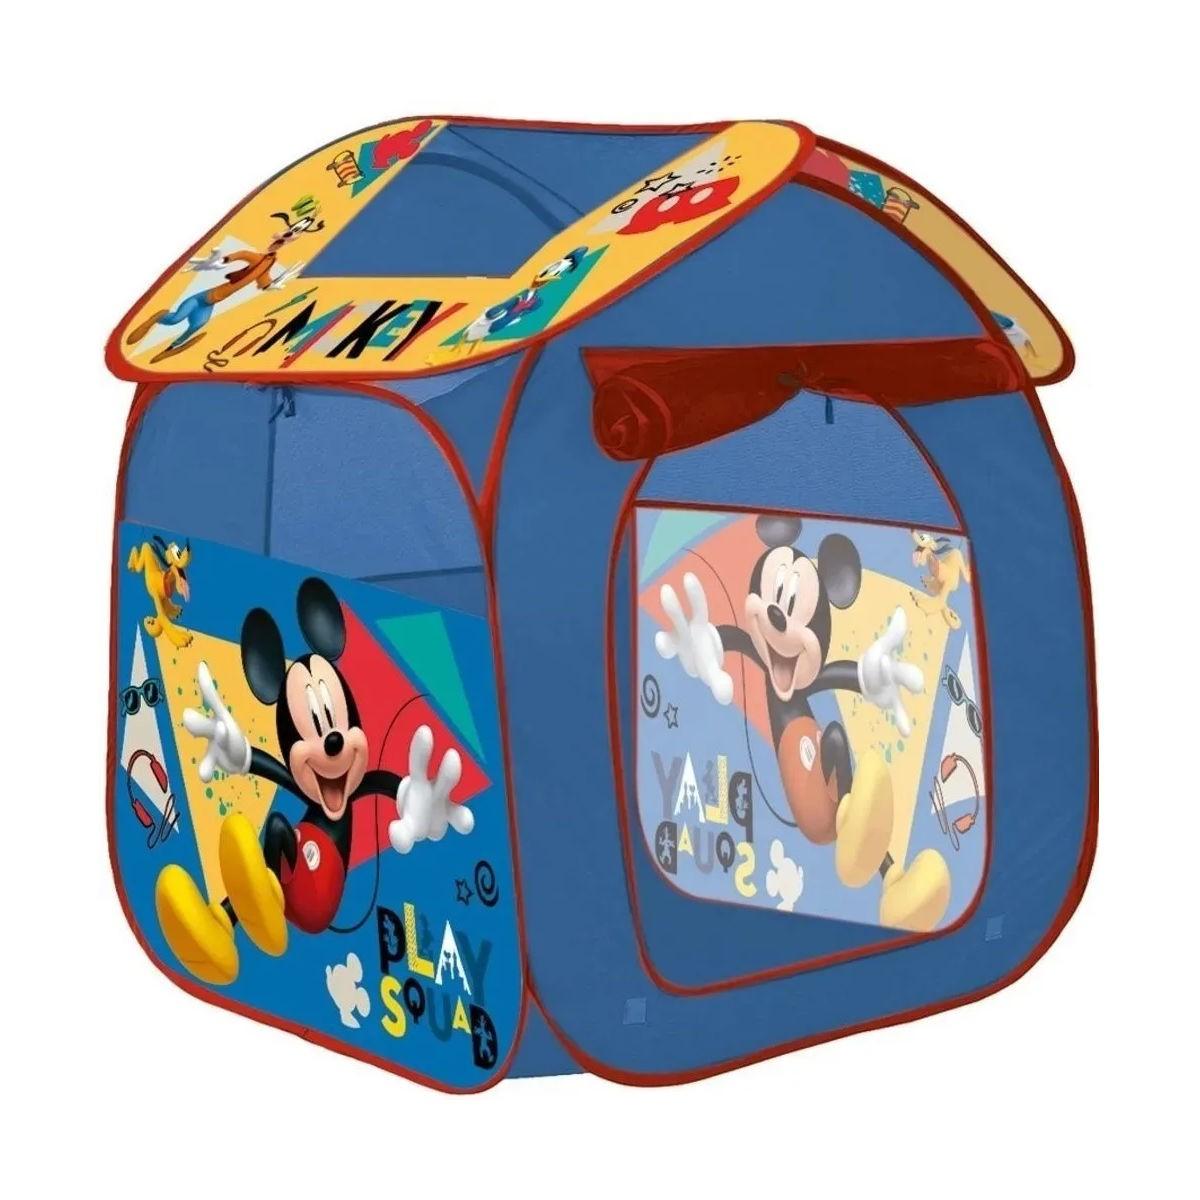 Barraca Portátil Mickey Dobrável Infantil Zippy Toys 6376